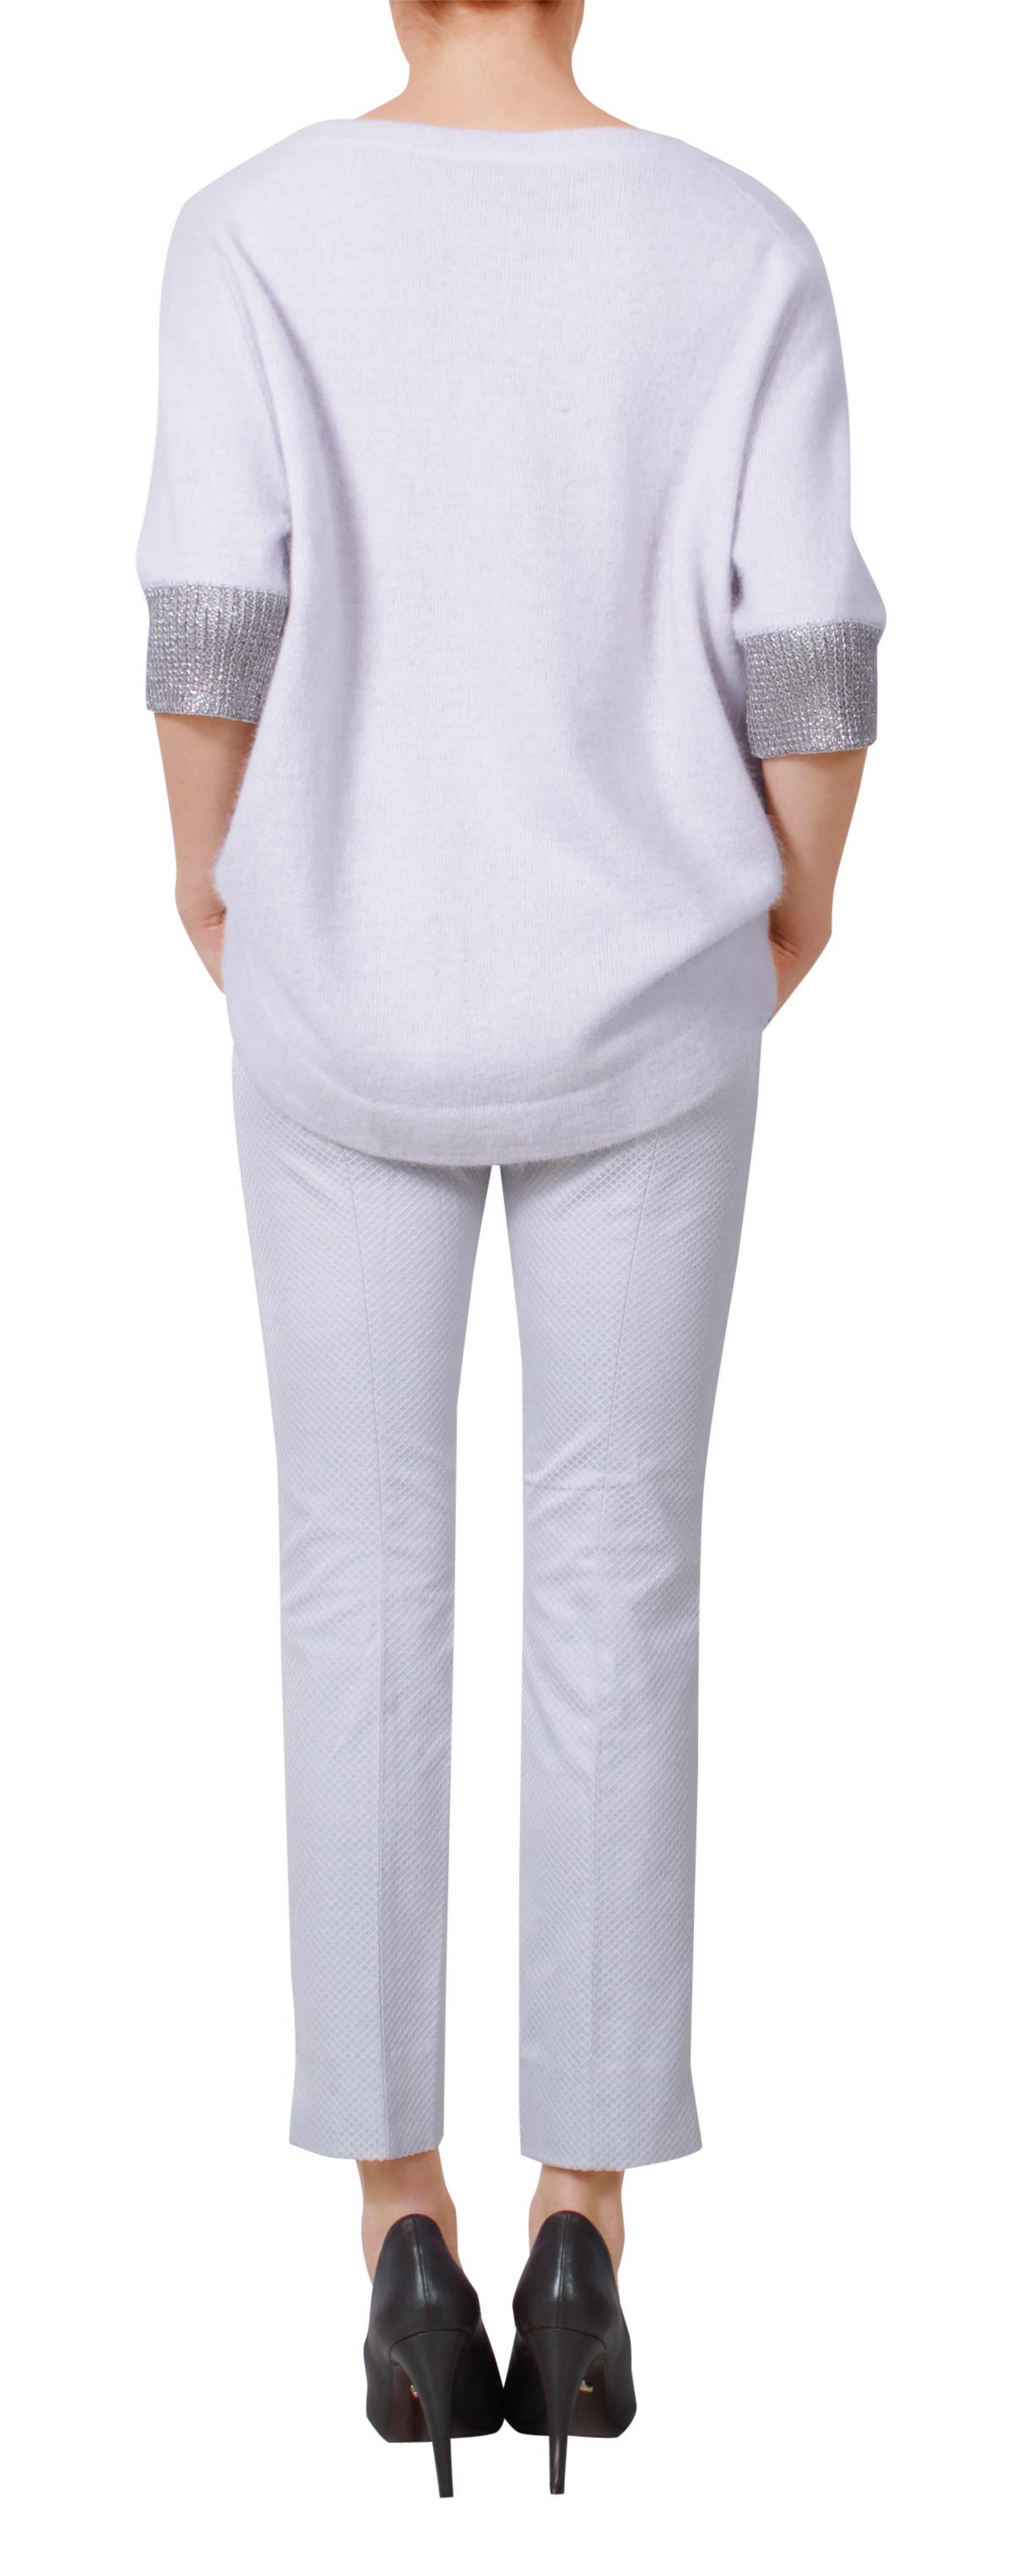 MINIMAL dorothee pants - Trousers - Onlineshop | SCHUMACHER - Onlineshop